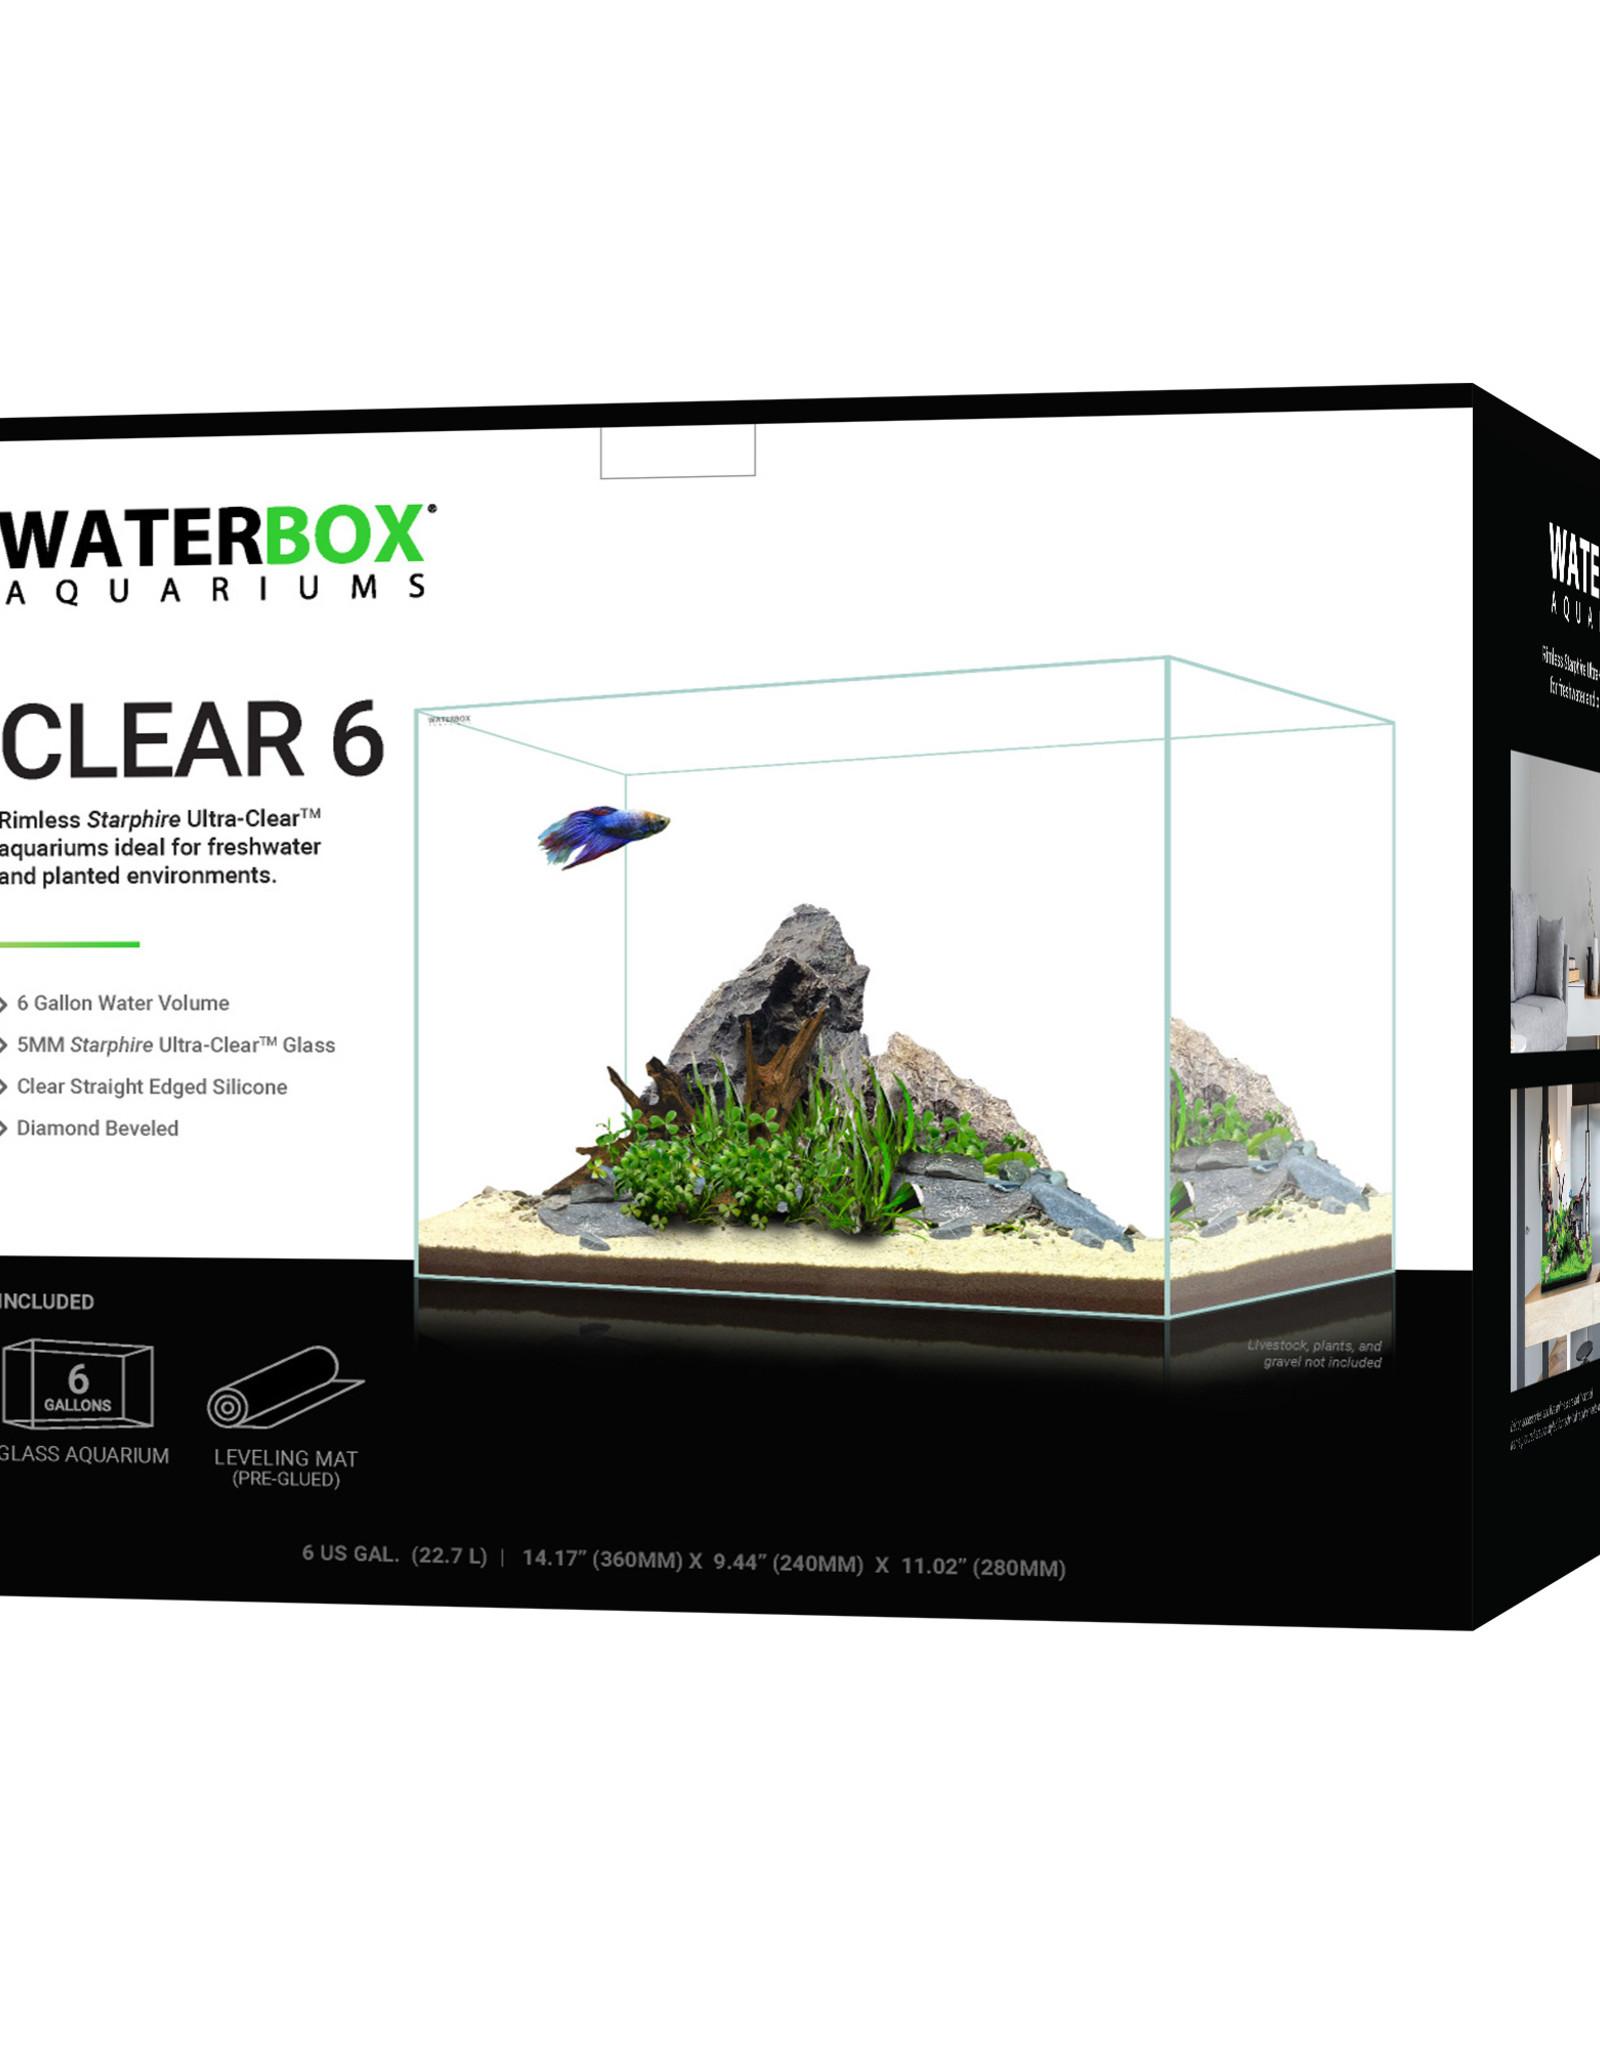 Waterbox Aquariums Waterbox Aquariums Clear 6